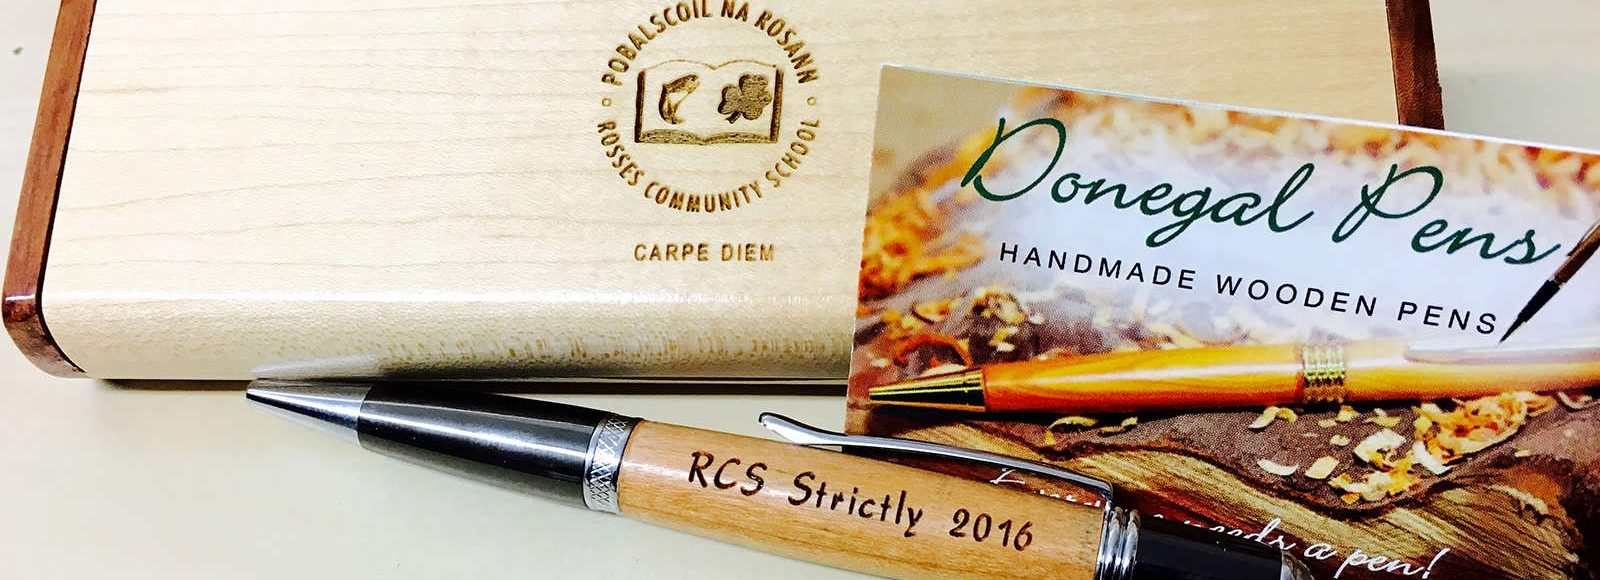 Handmade Wooden Pens Engraving